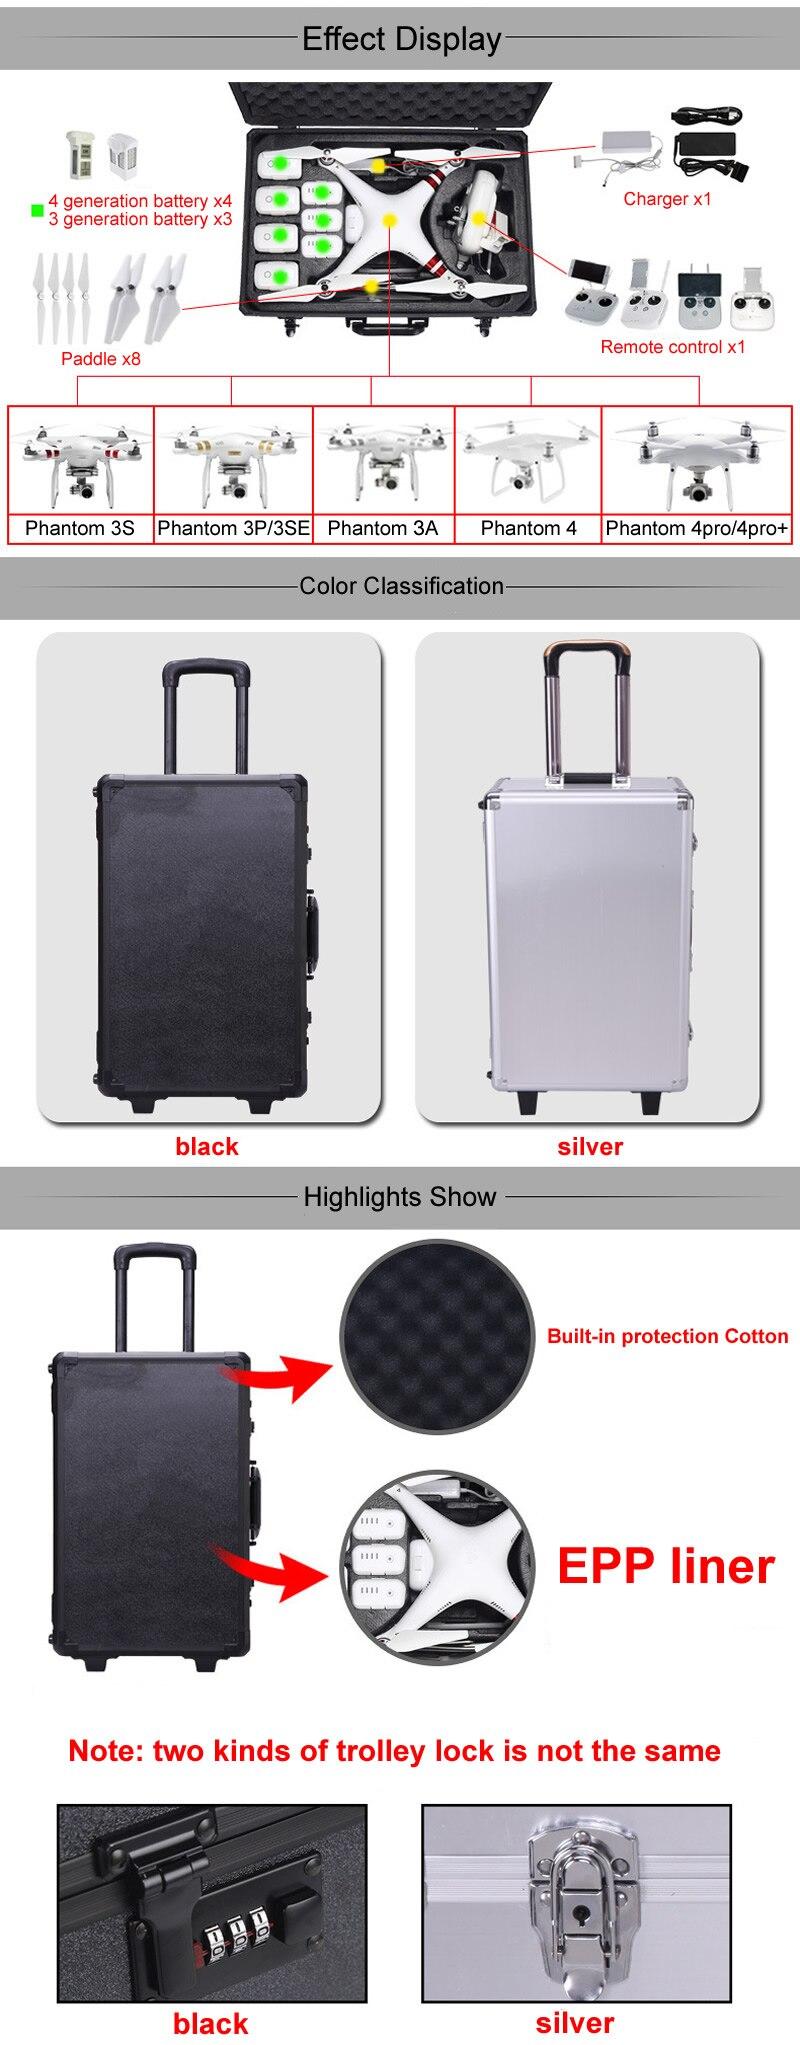 DJI Phantom 4 Drone Upscale Hard Shell Suitcase PHANTOM 3 Universal Standard Advanced Protection Quadcopter dji Trolley Case Box